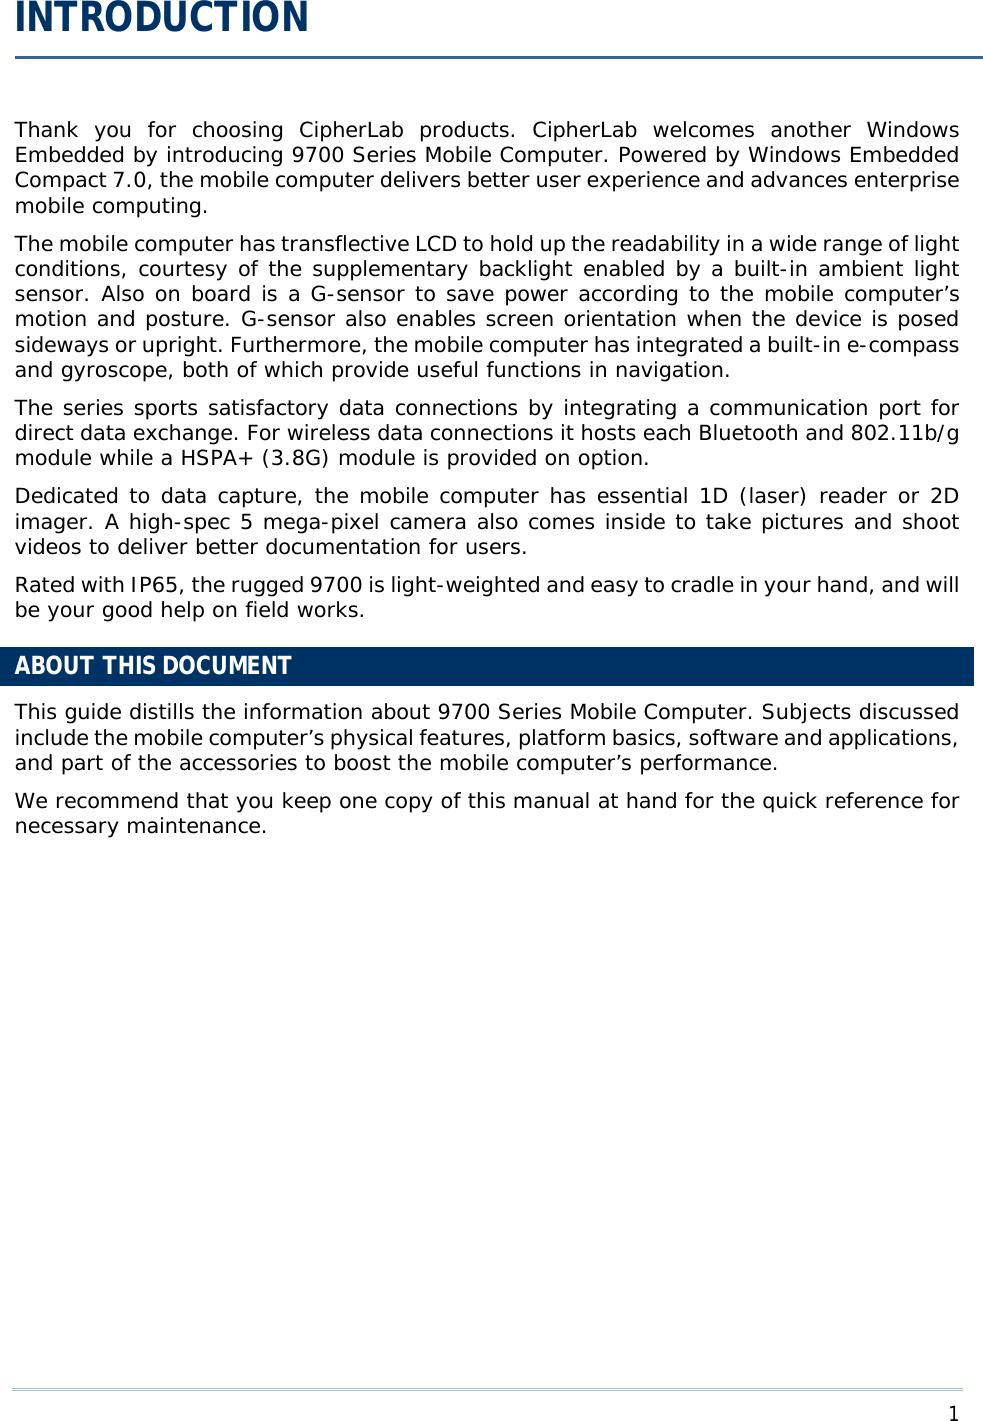 California academy of sciences architecture case study pdf